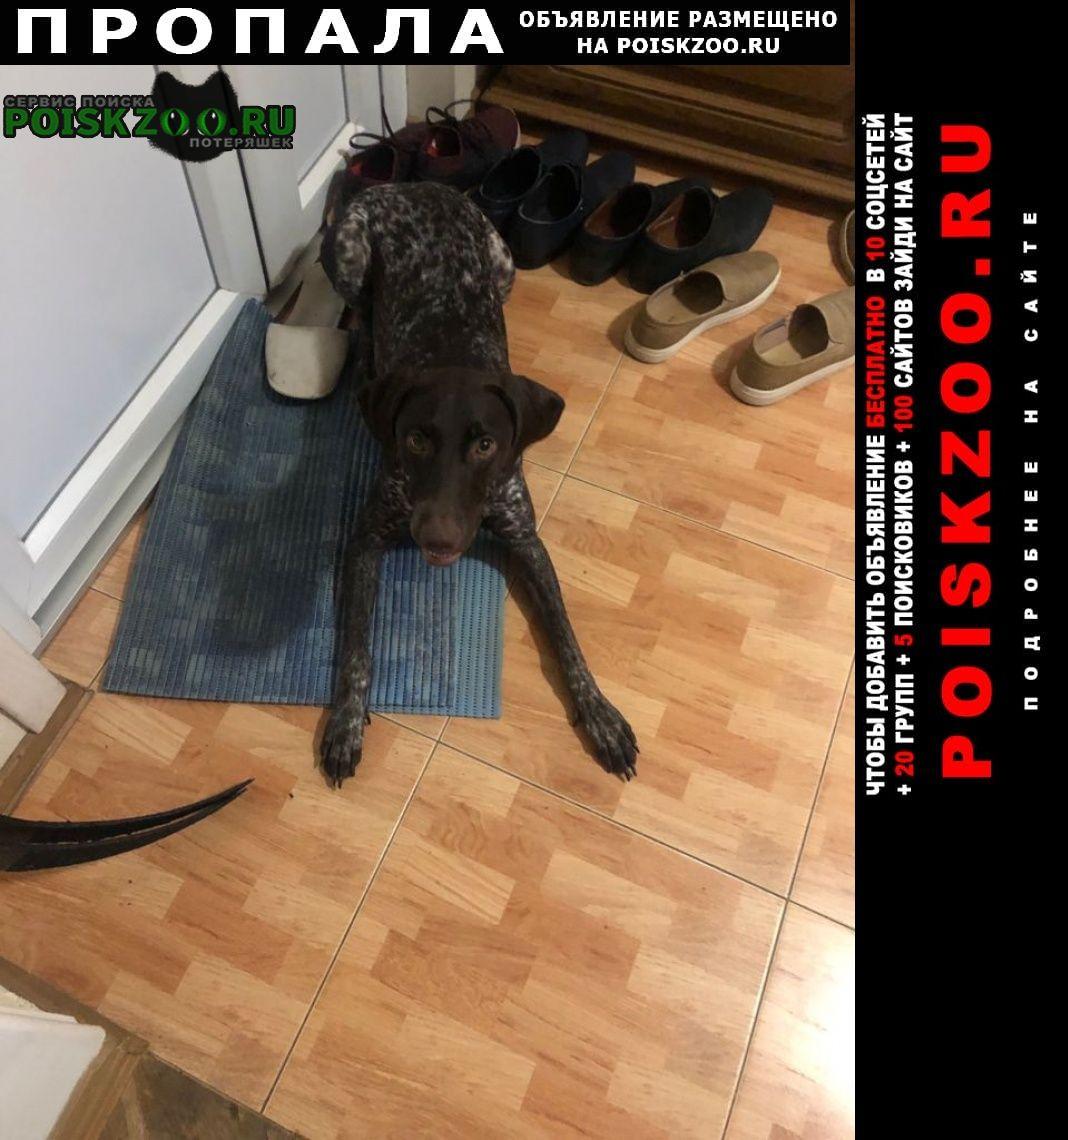 Пропала собака потерялась курцхаар Краснодар